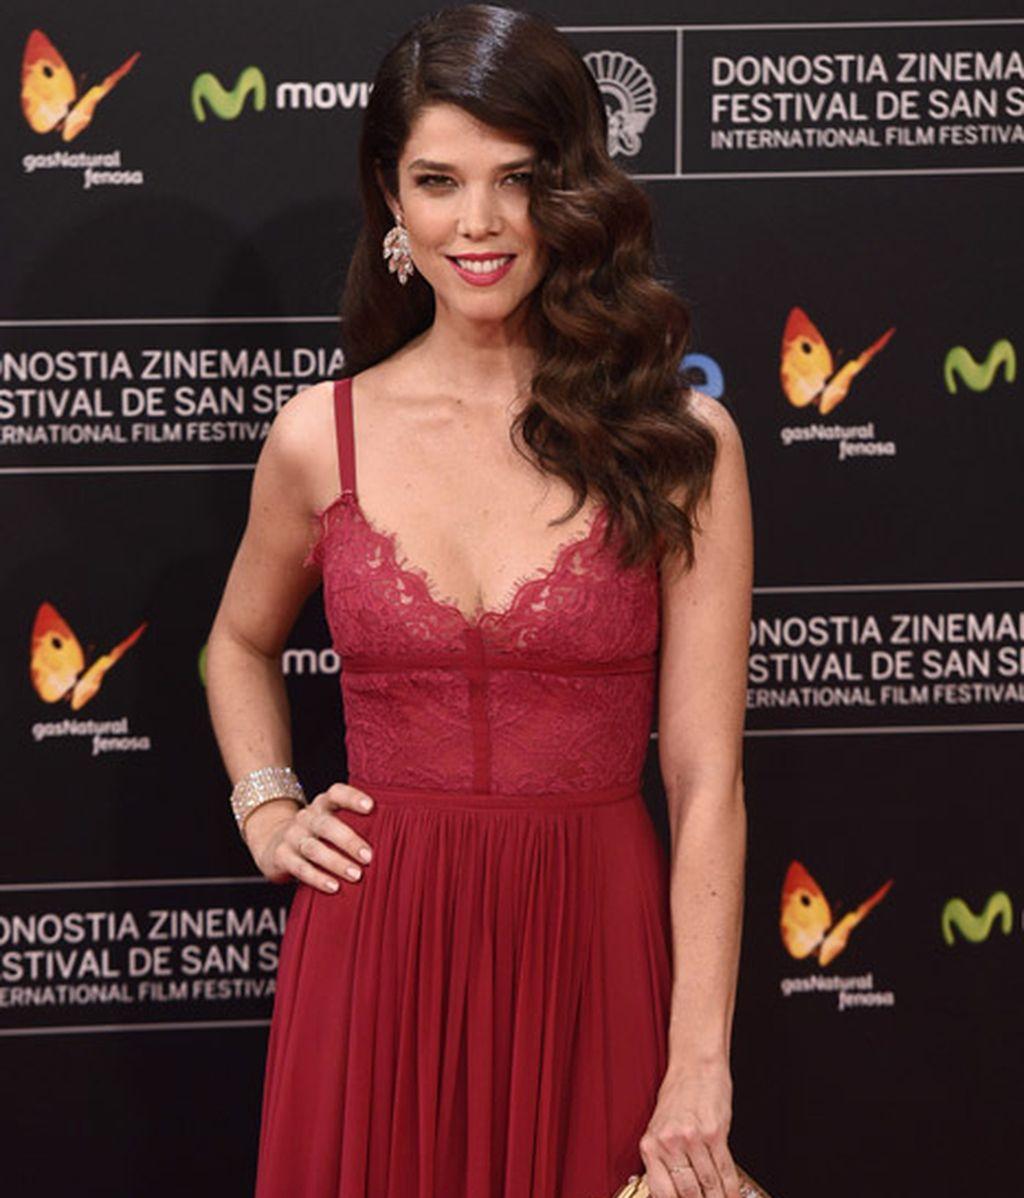 Juana Acosta, elegantísima en burdeos